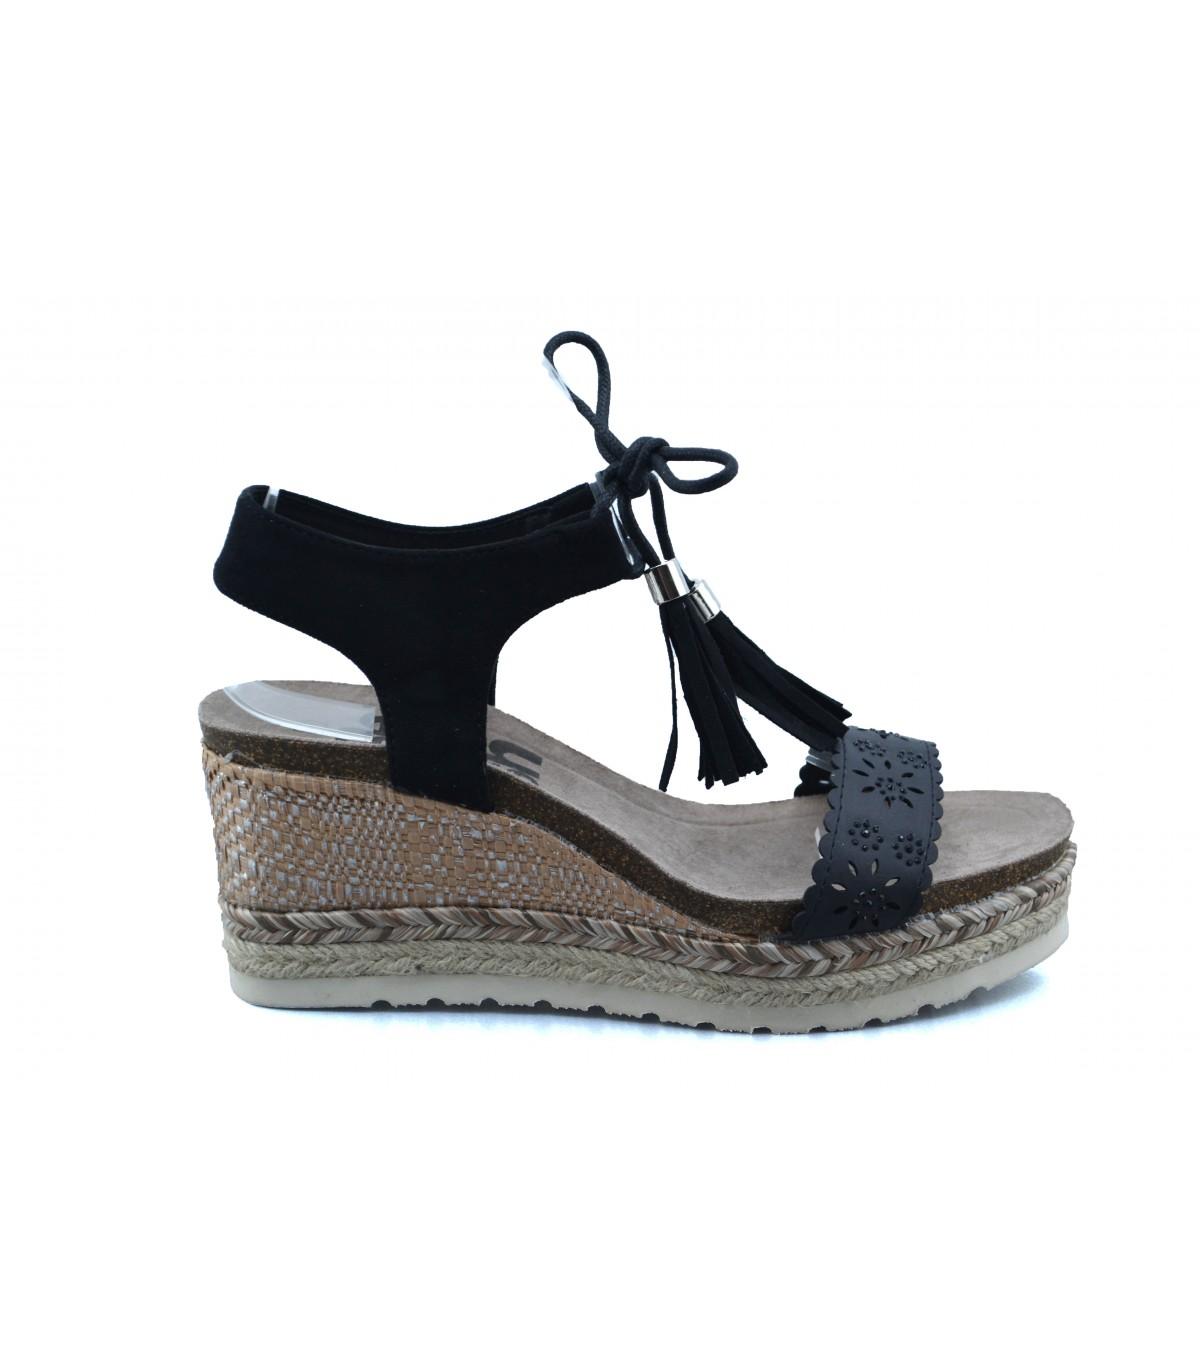 c7d07679 Sandalias cuña mujer REFRESH 69827 | Zapatos Online | Calzado Mujer